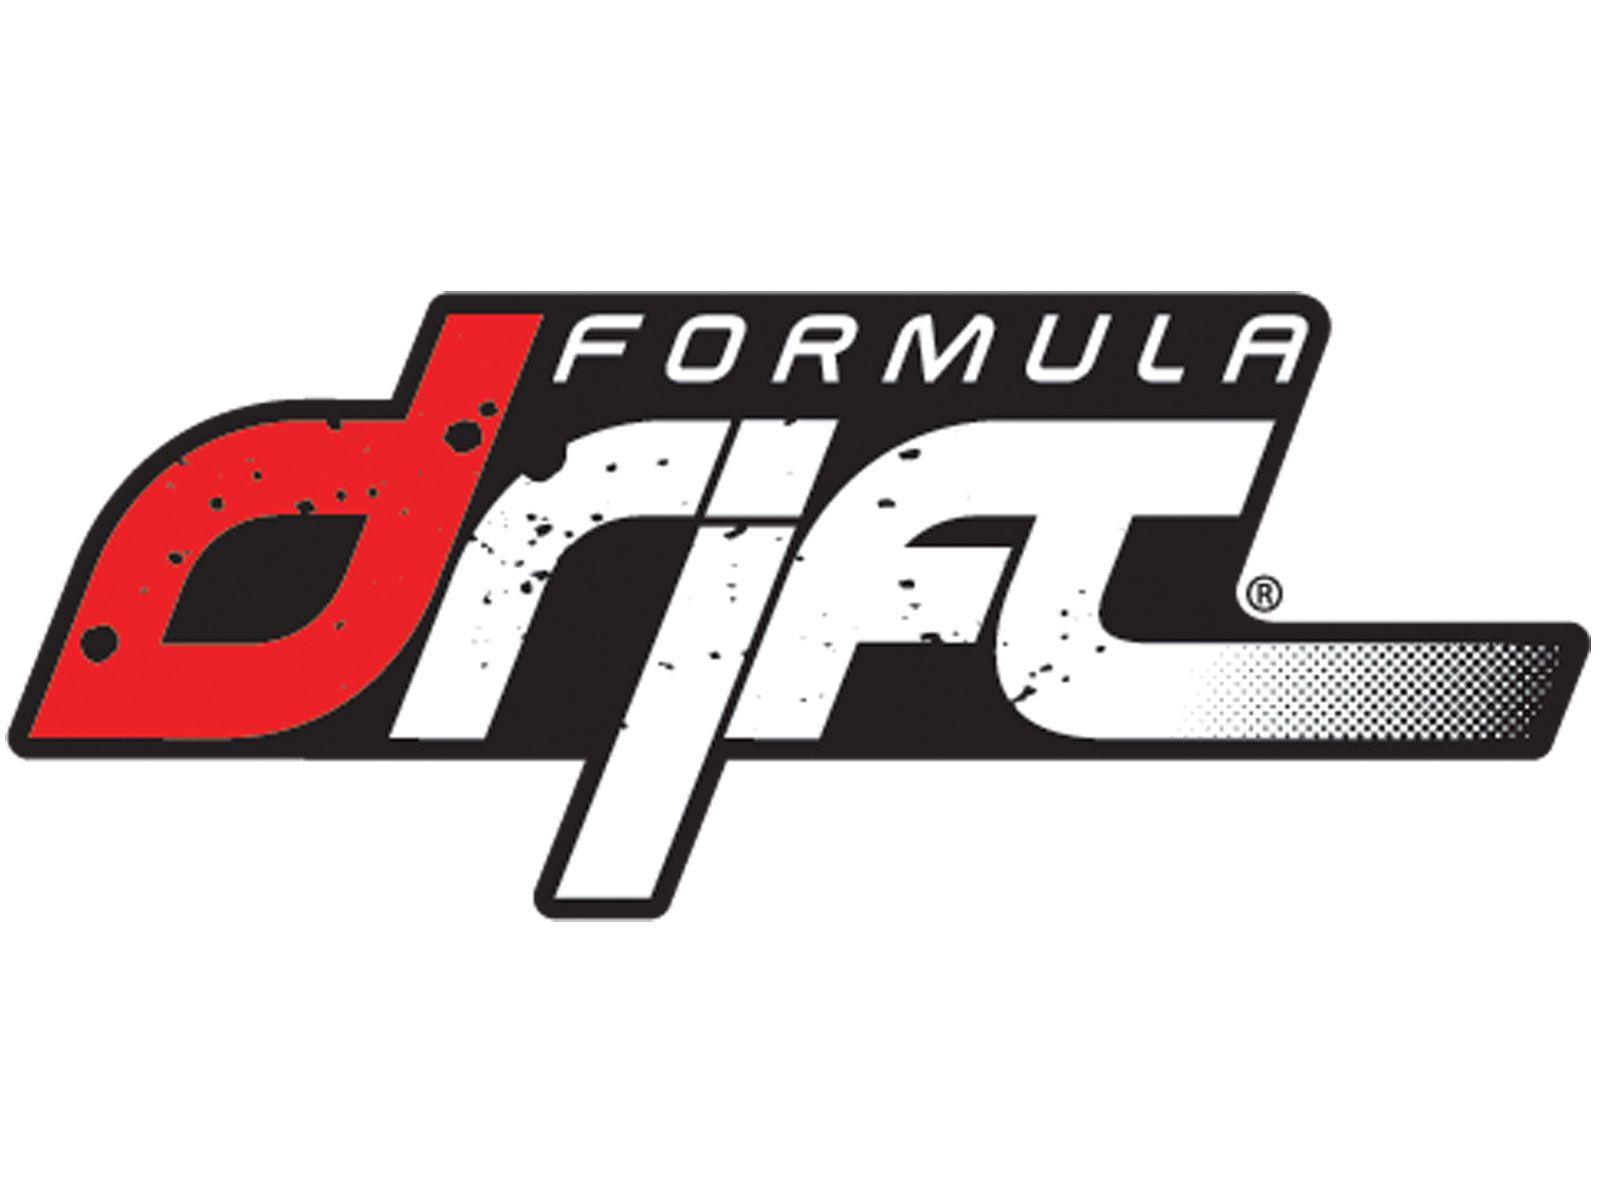 Drift logo google bike graphic design pinterest logo drift logo google biocorpaavc Image collections